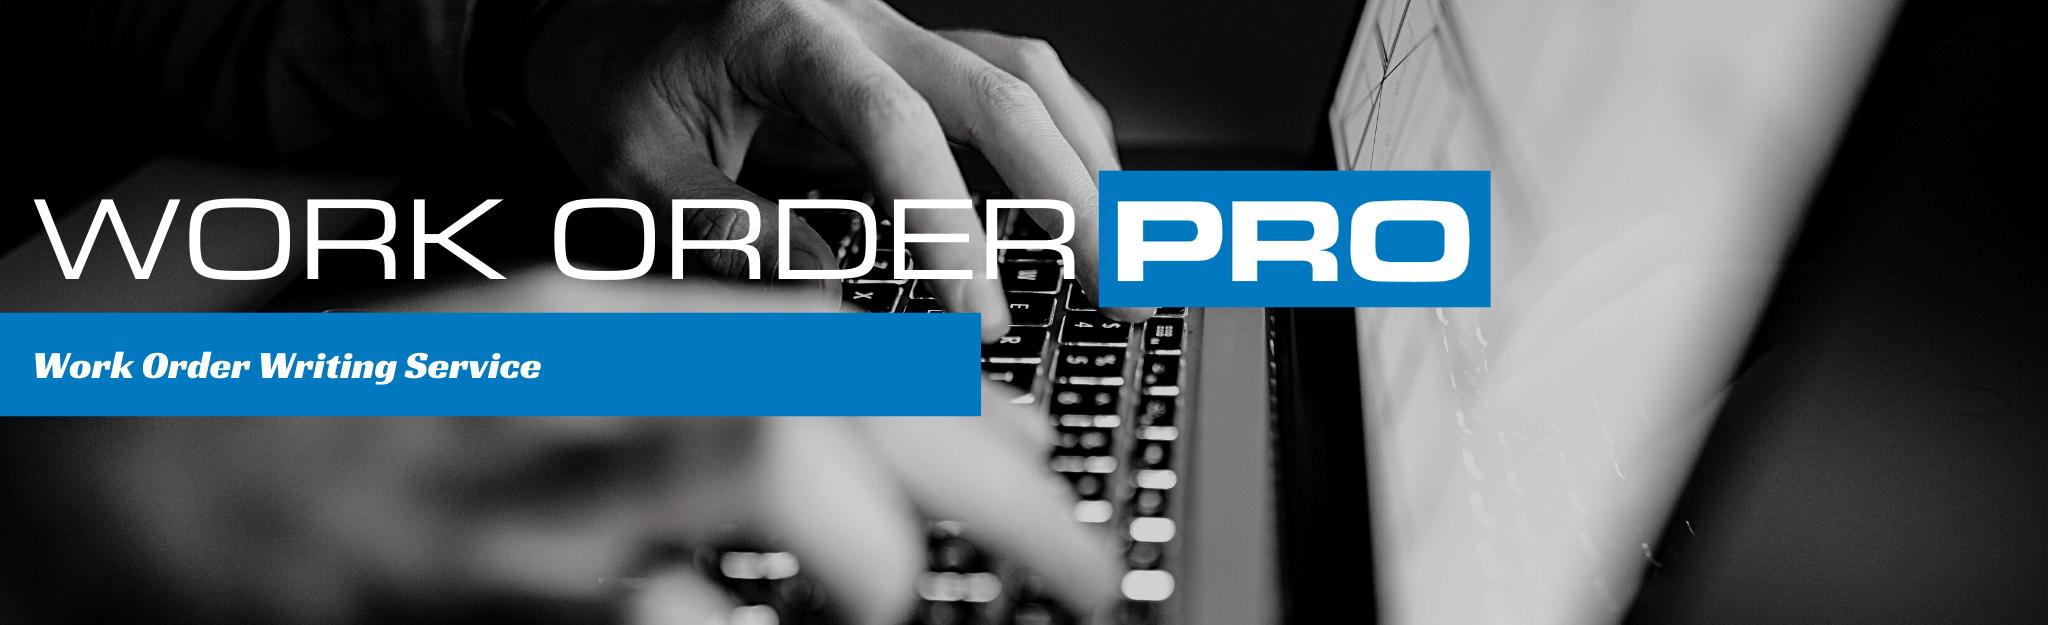 Lube Program Work Order Writing Service